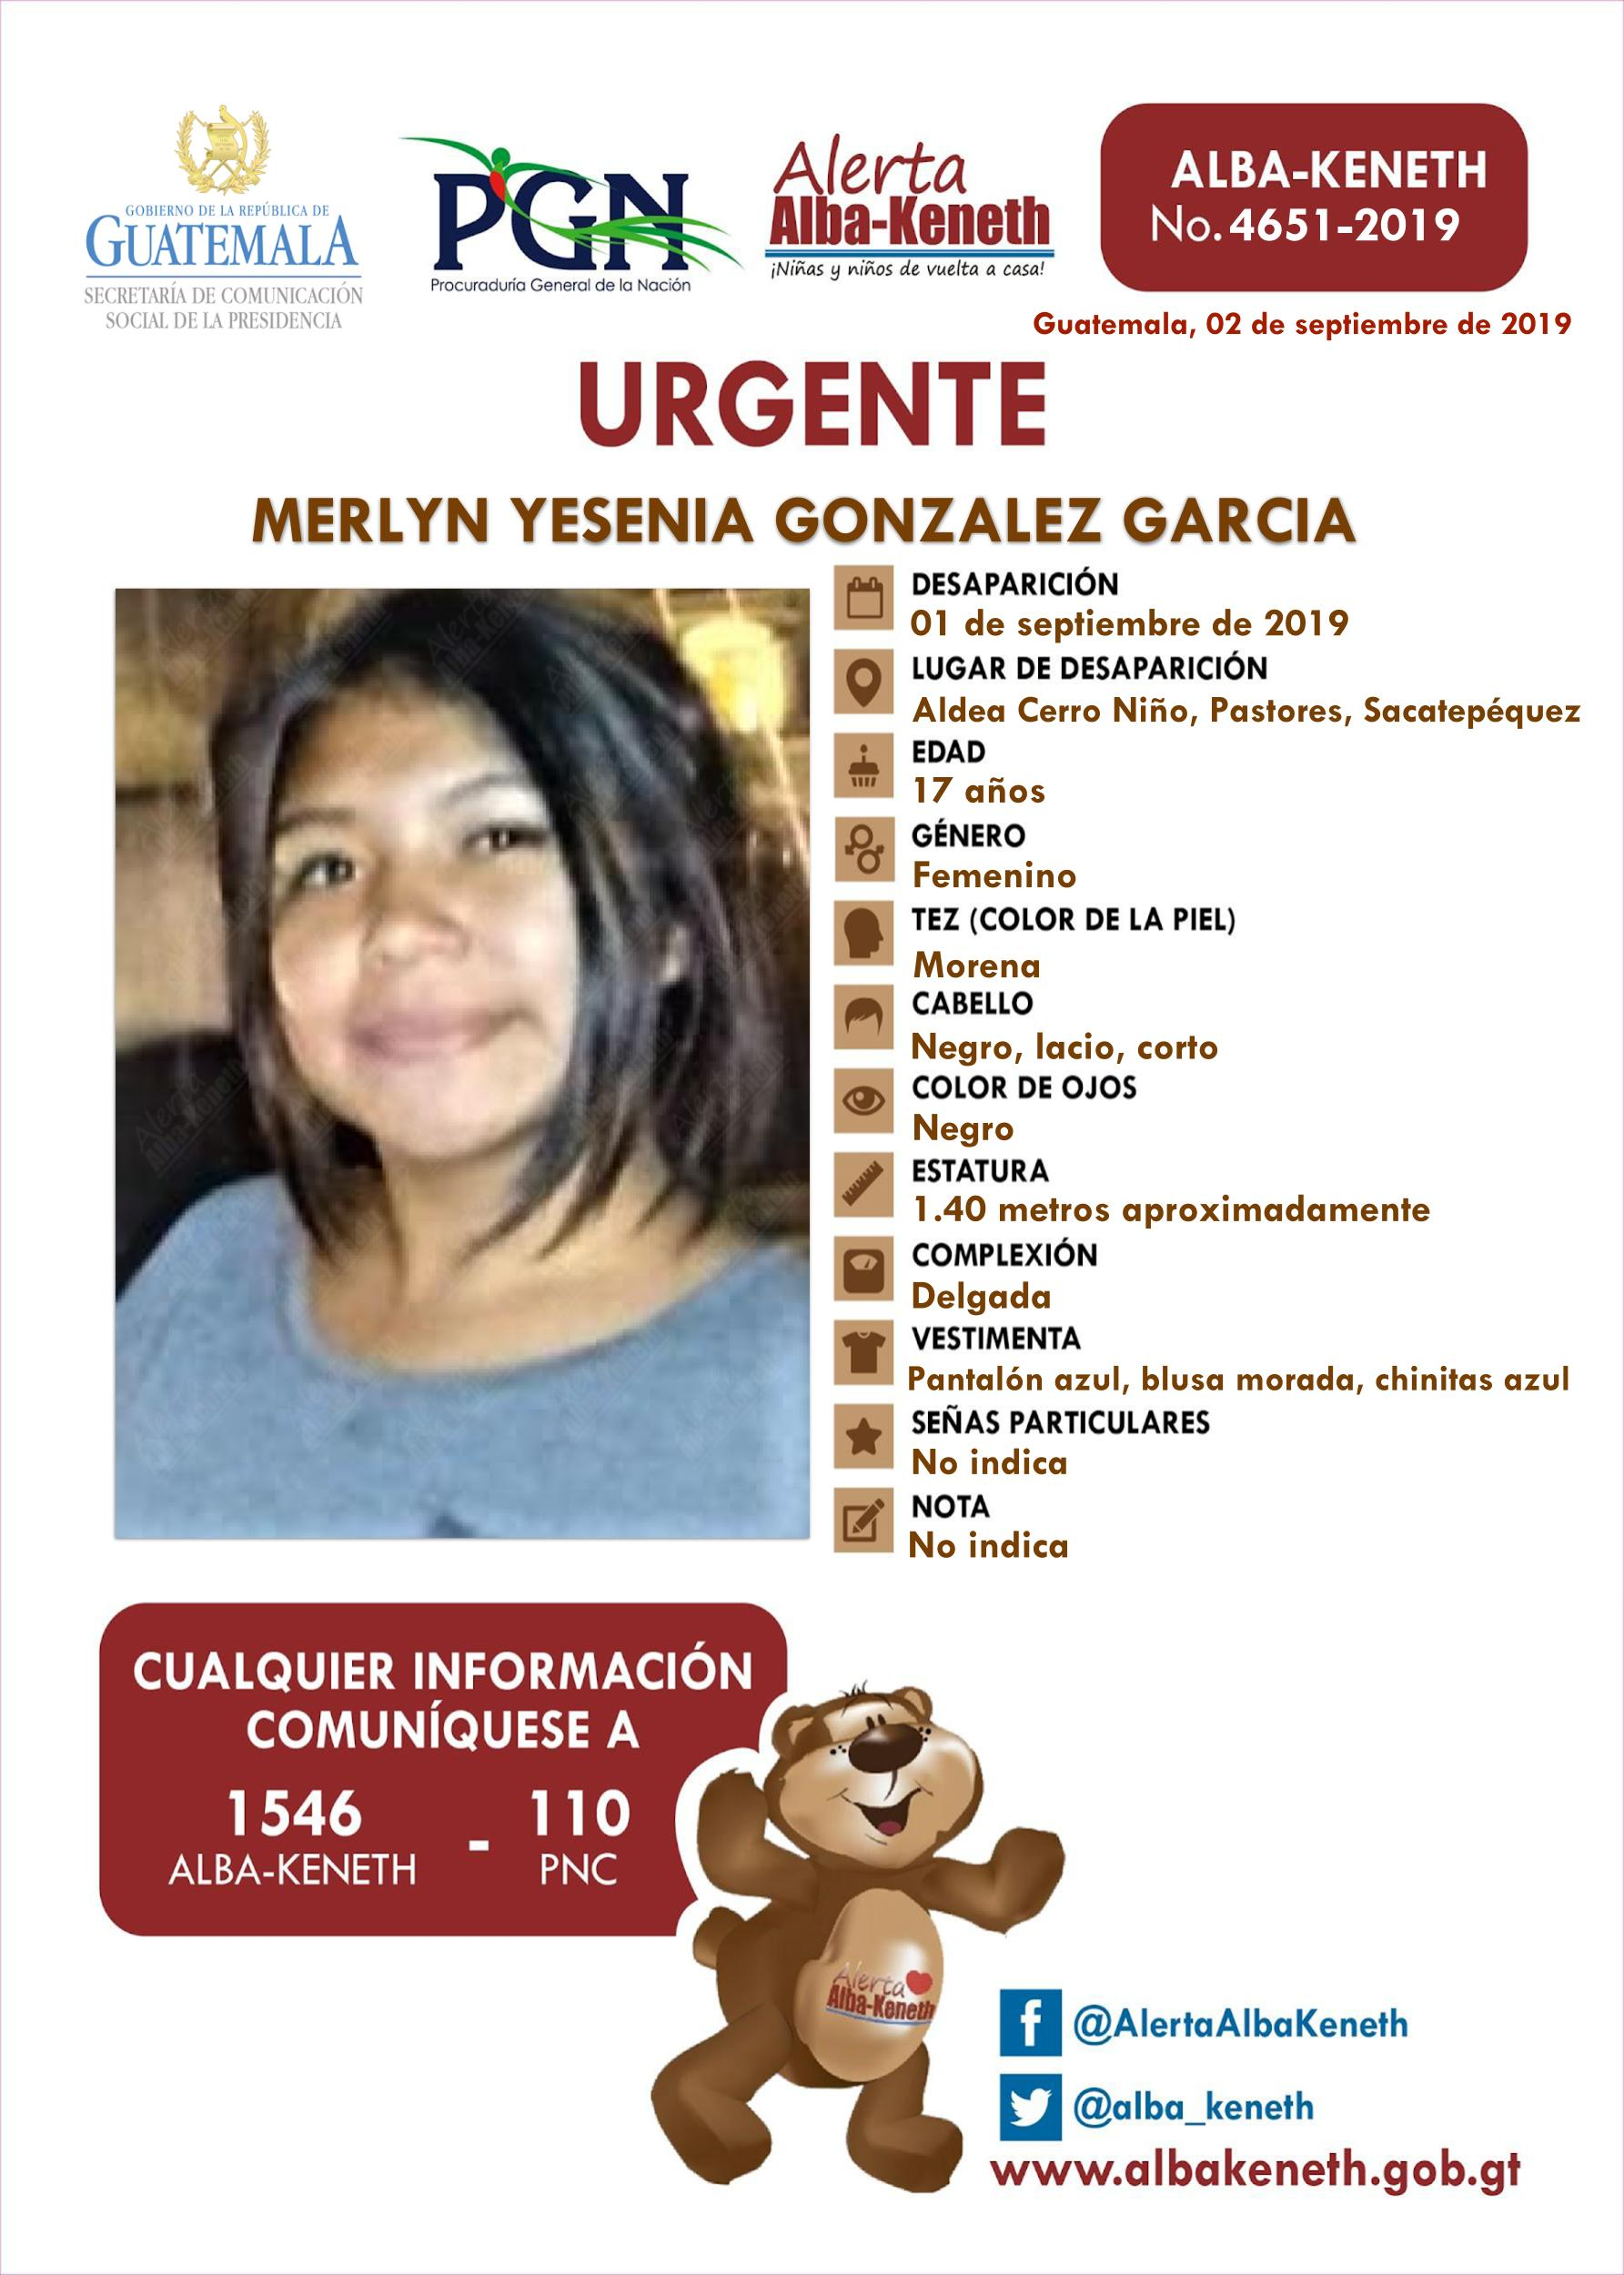 Merlyn Yesenia Gonzalez Garcia